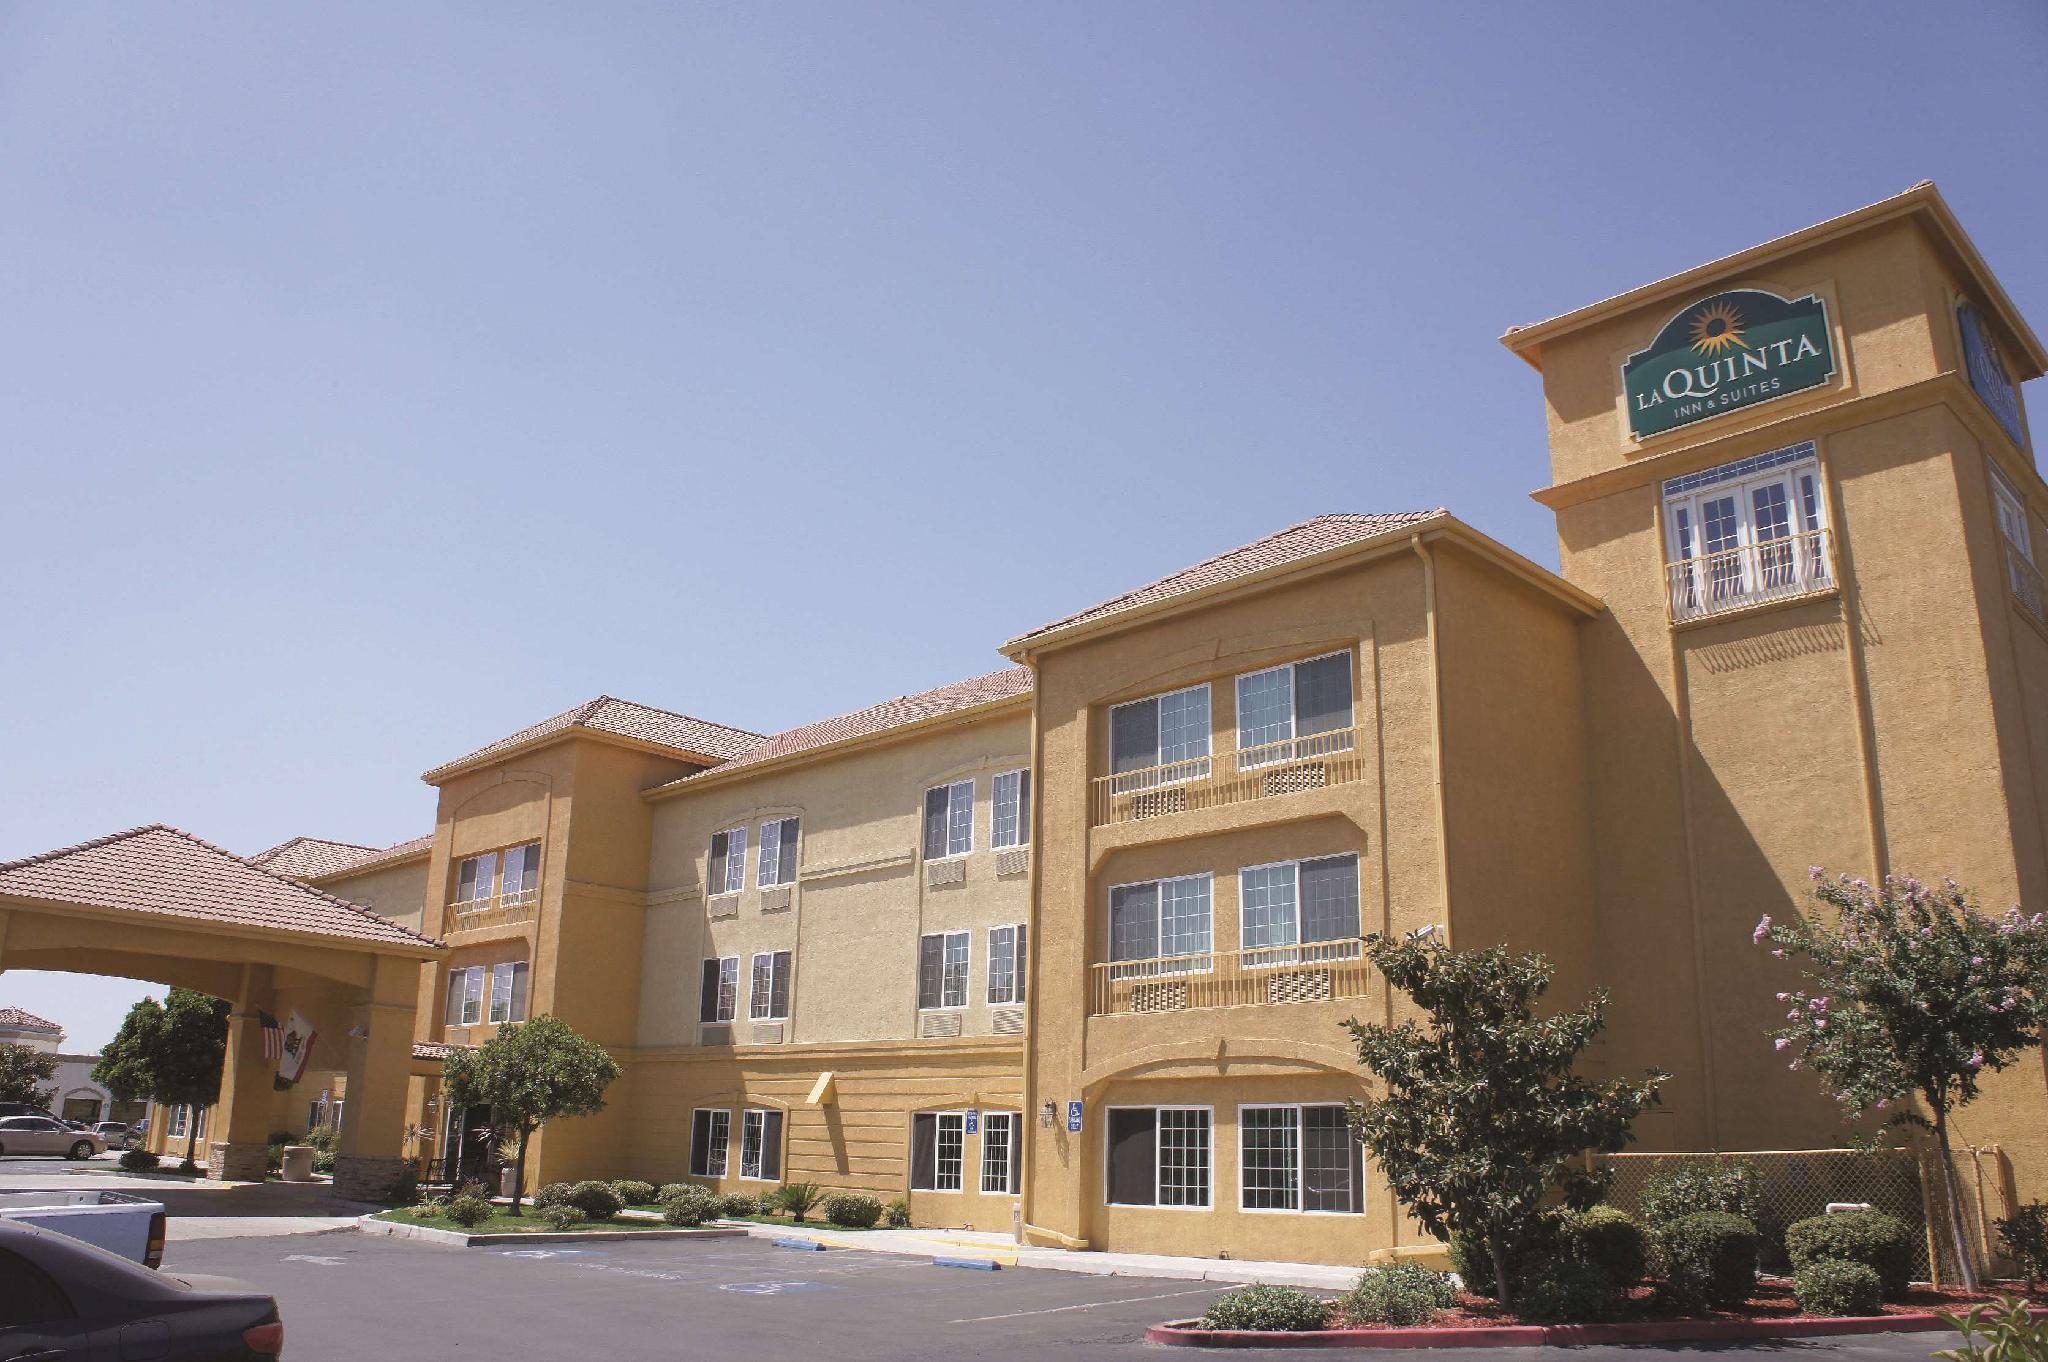 La Quinta Inn And Suites By Wyndham Visalia Sequoia Gateway